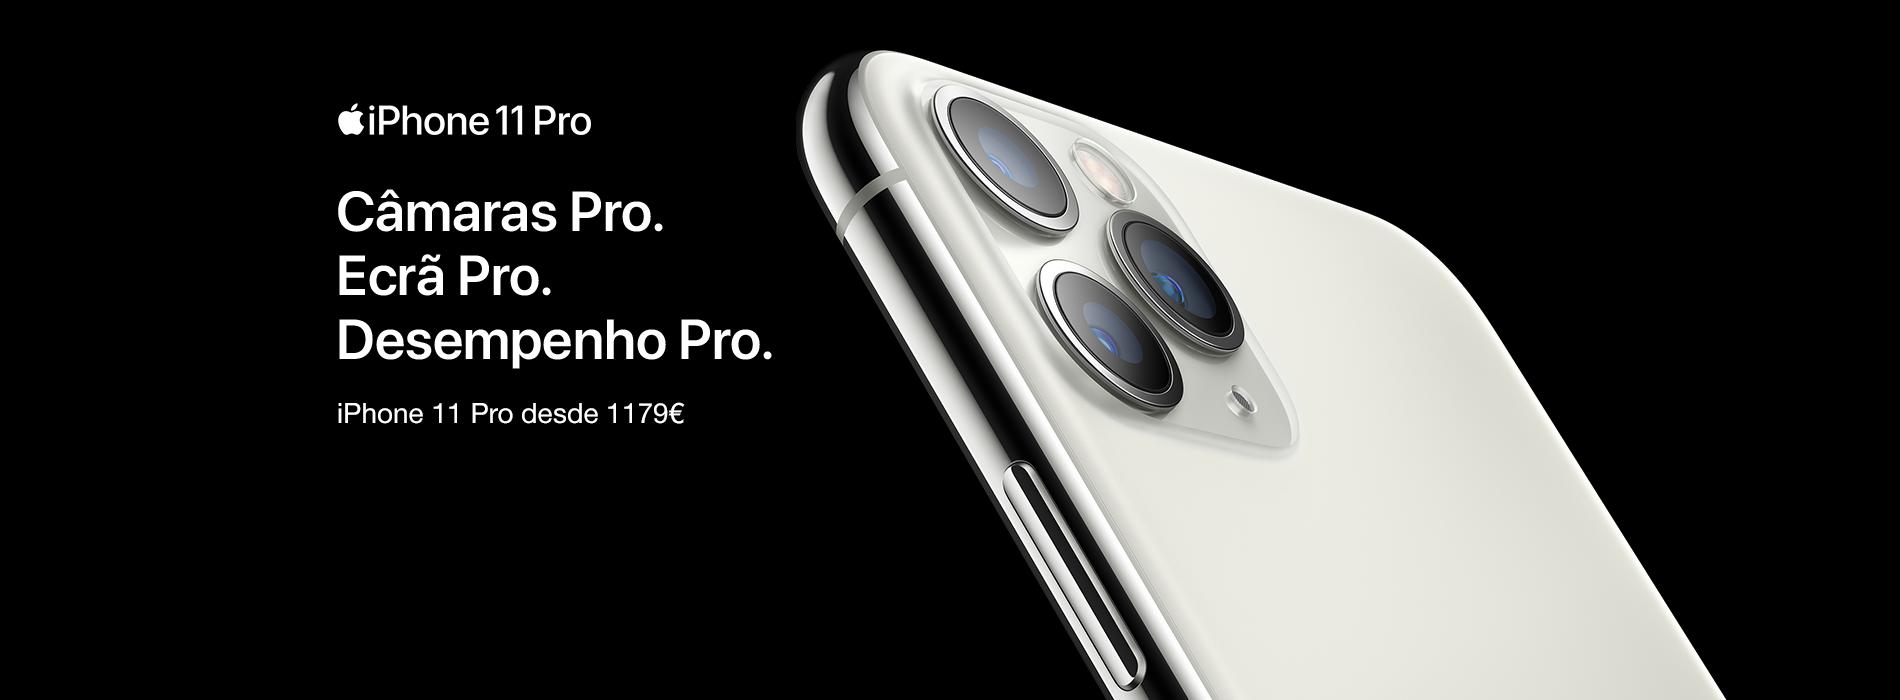 Homepage Slideshow - iPhone 11 Pro